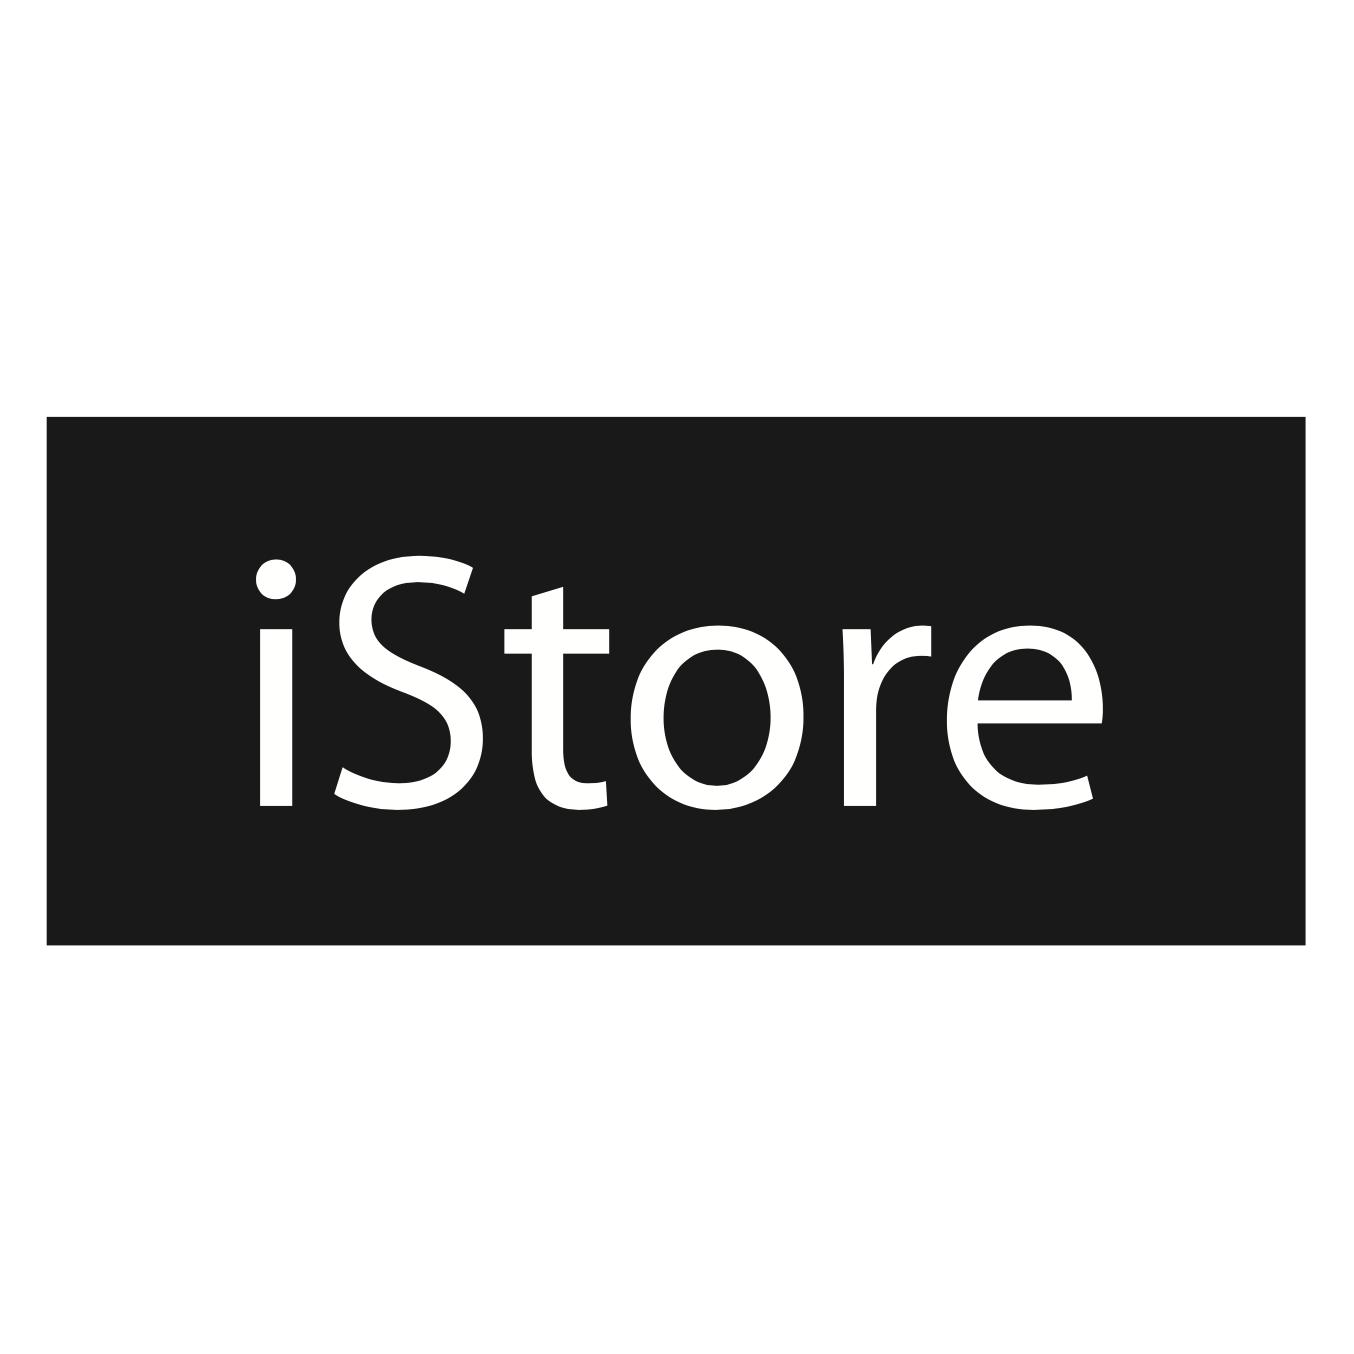 iPhone 12 mini 64GB - White